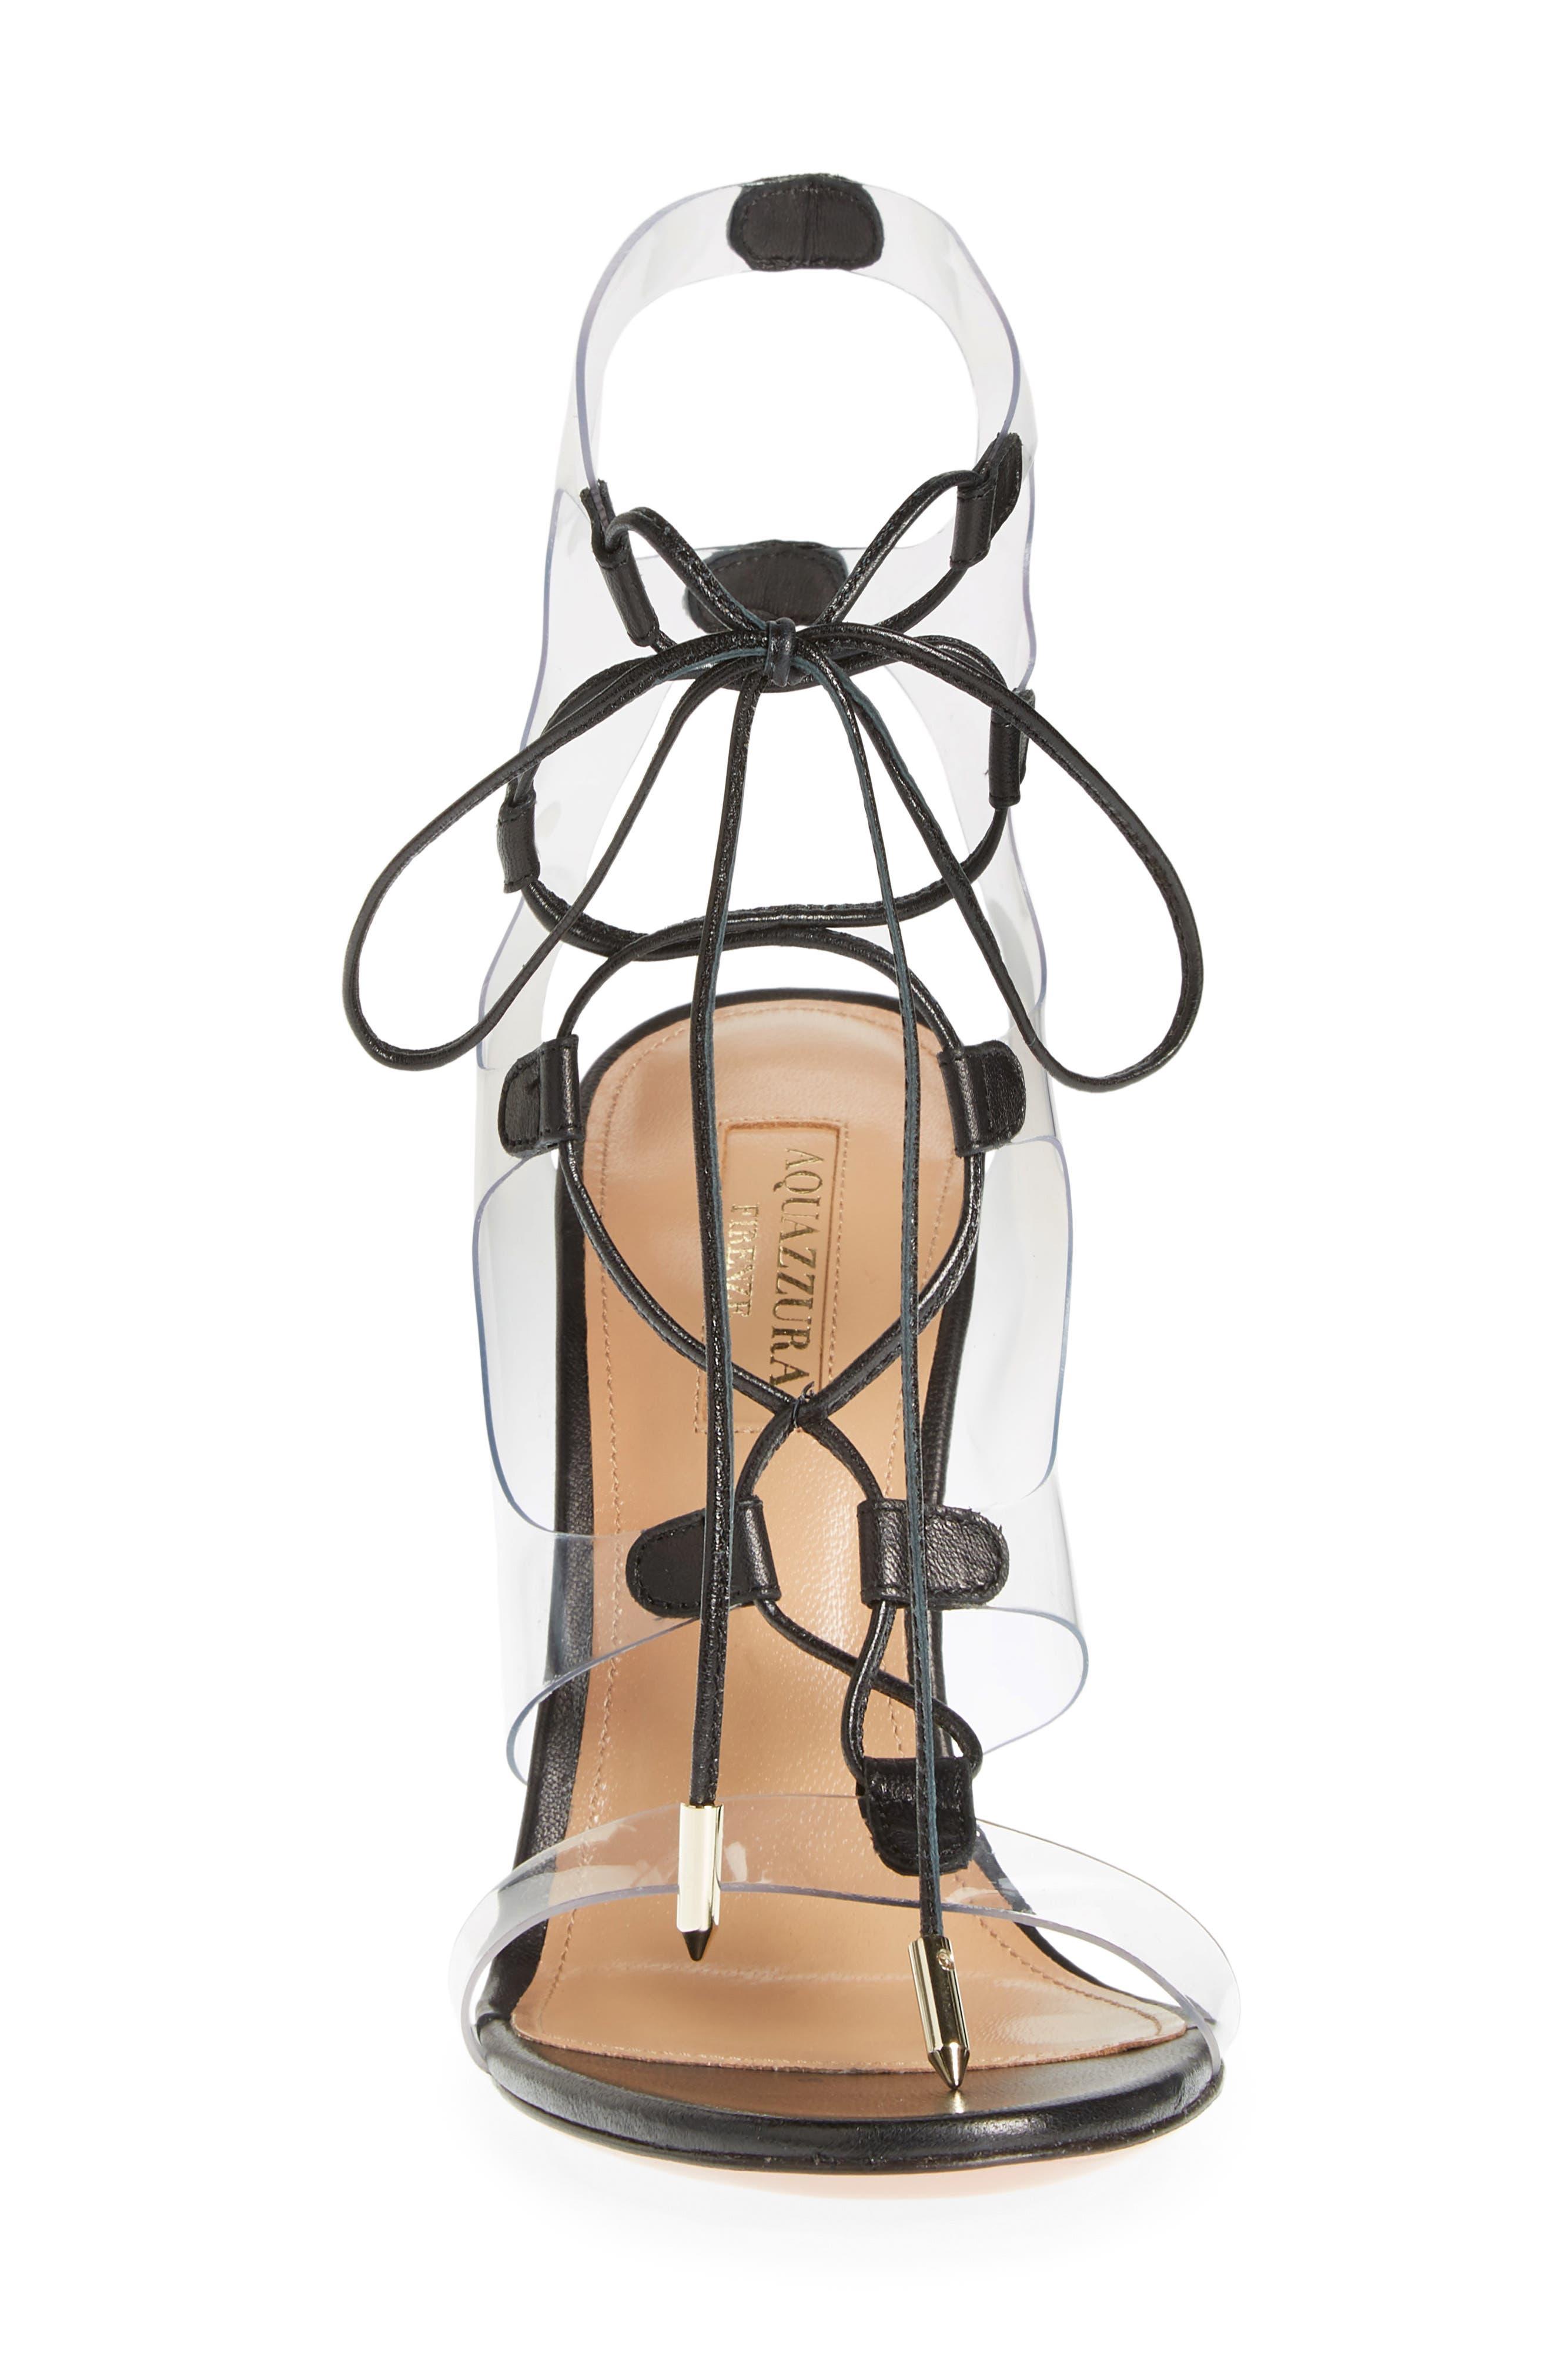 AQUAZZURA, Milos PVC Lace-Up Sandal, Alternate thumbnail 4, color, BLACK